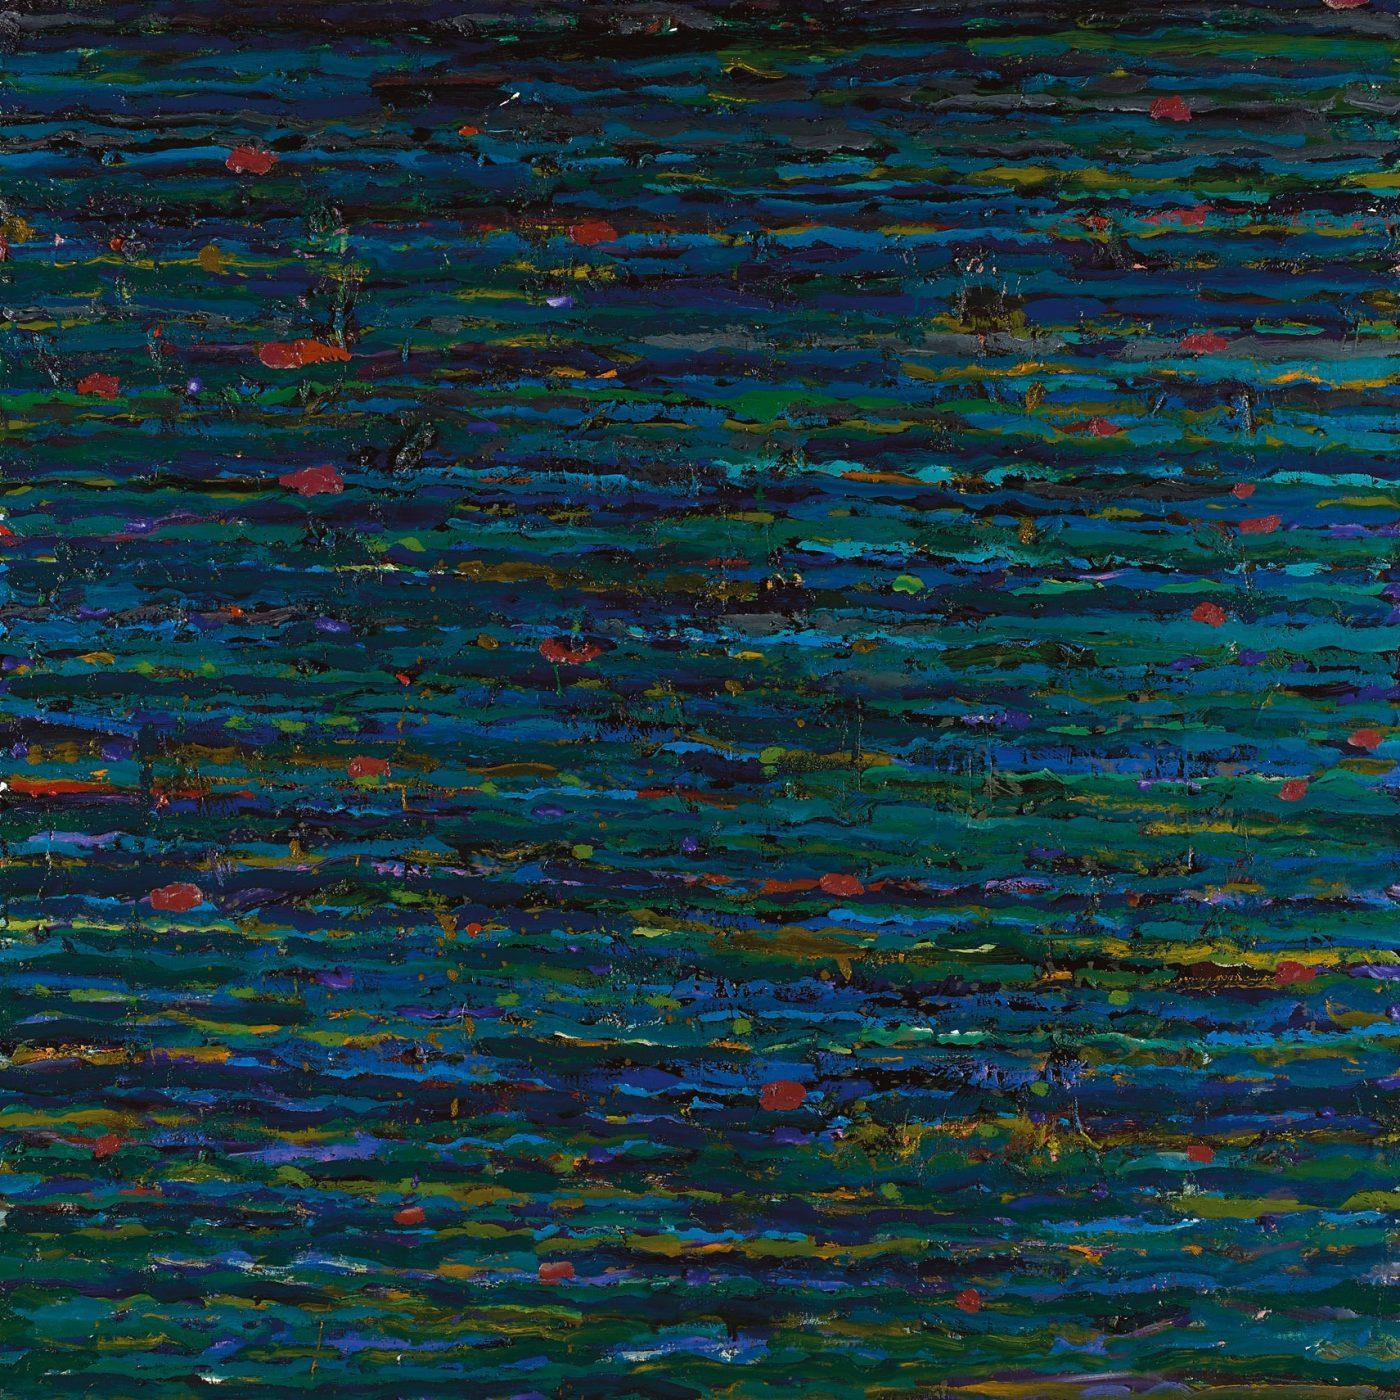 Amit Cabessa, 2019, Oil on canvas 150 x 150 cm